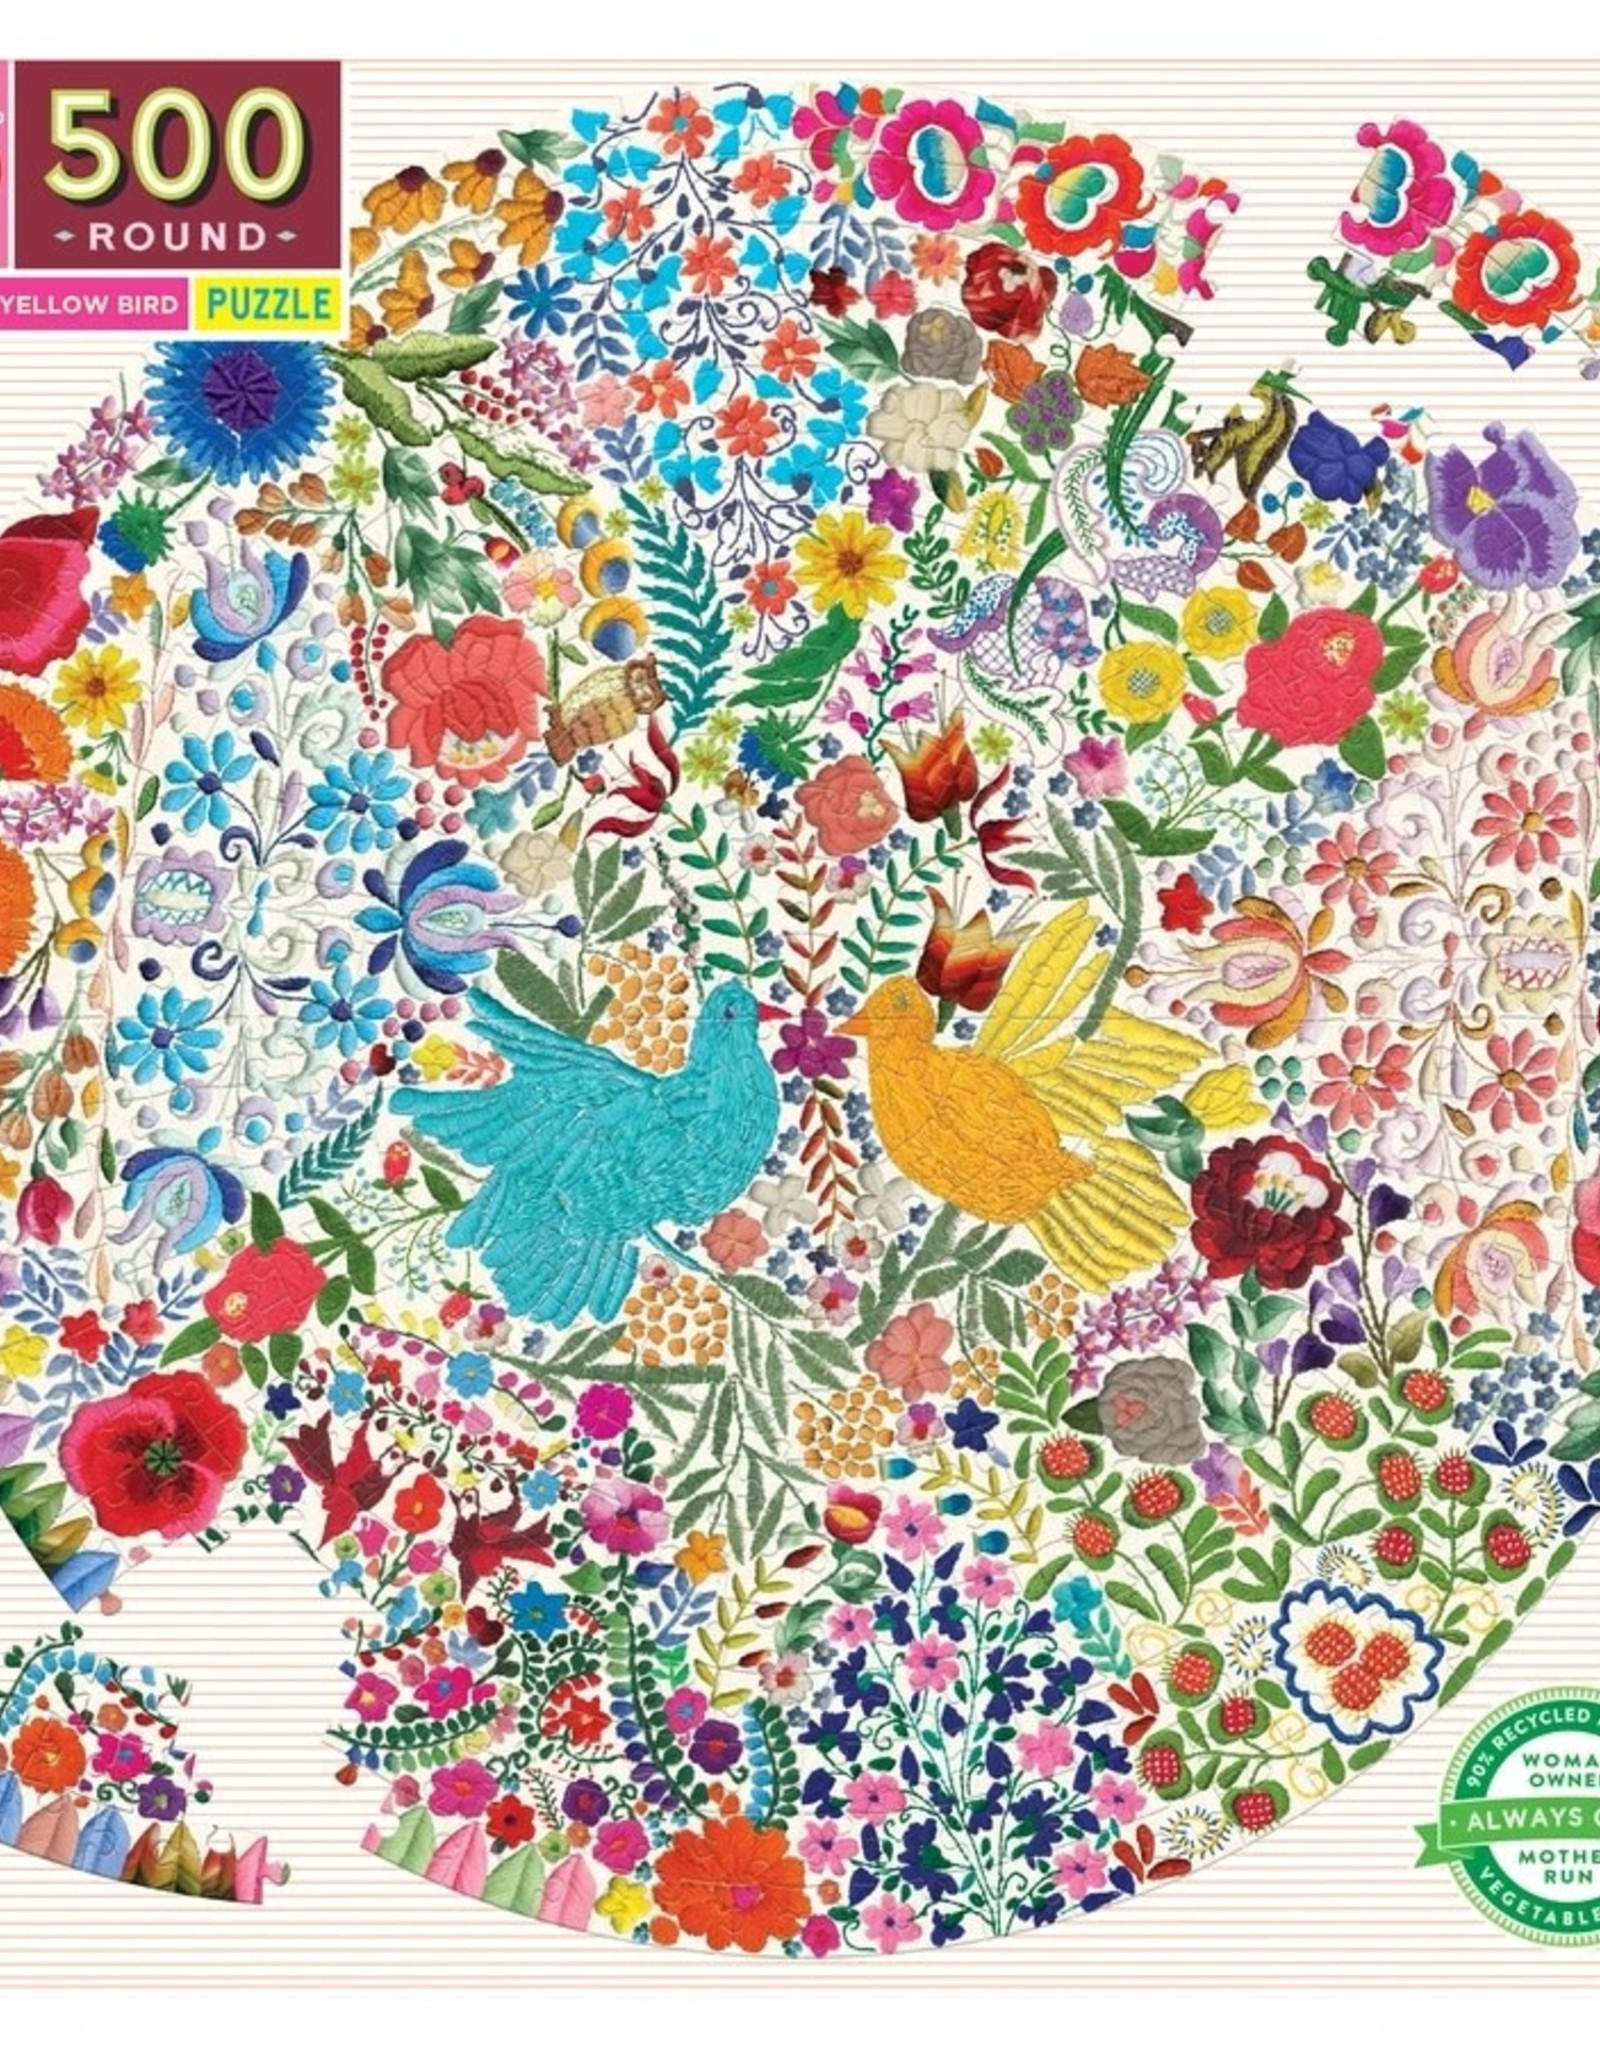 Eeboo 500pc Round Blue Bird Yellow Bird Puzzle